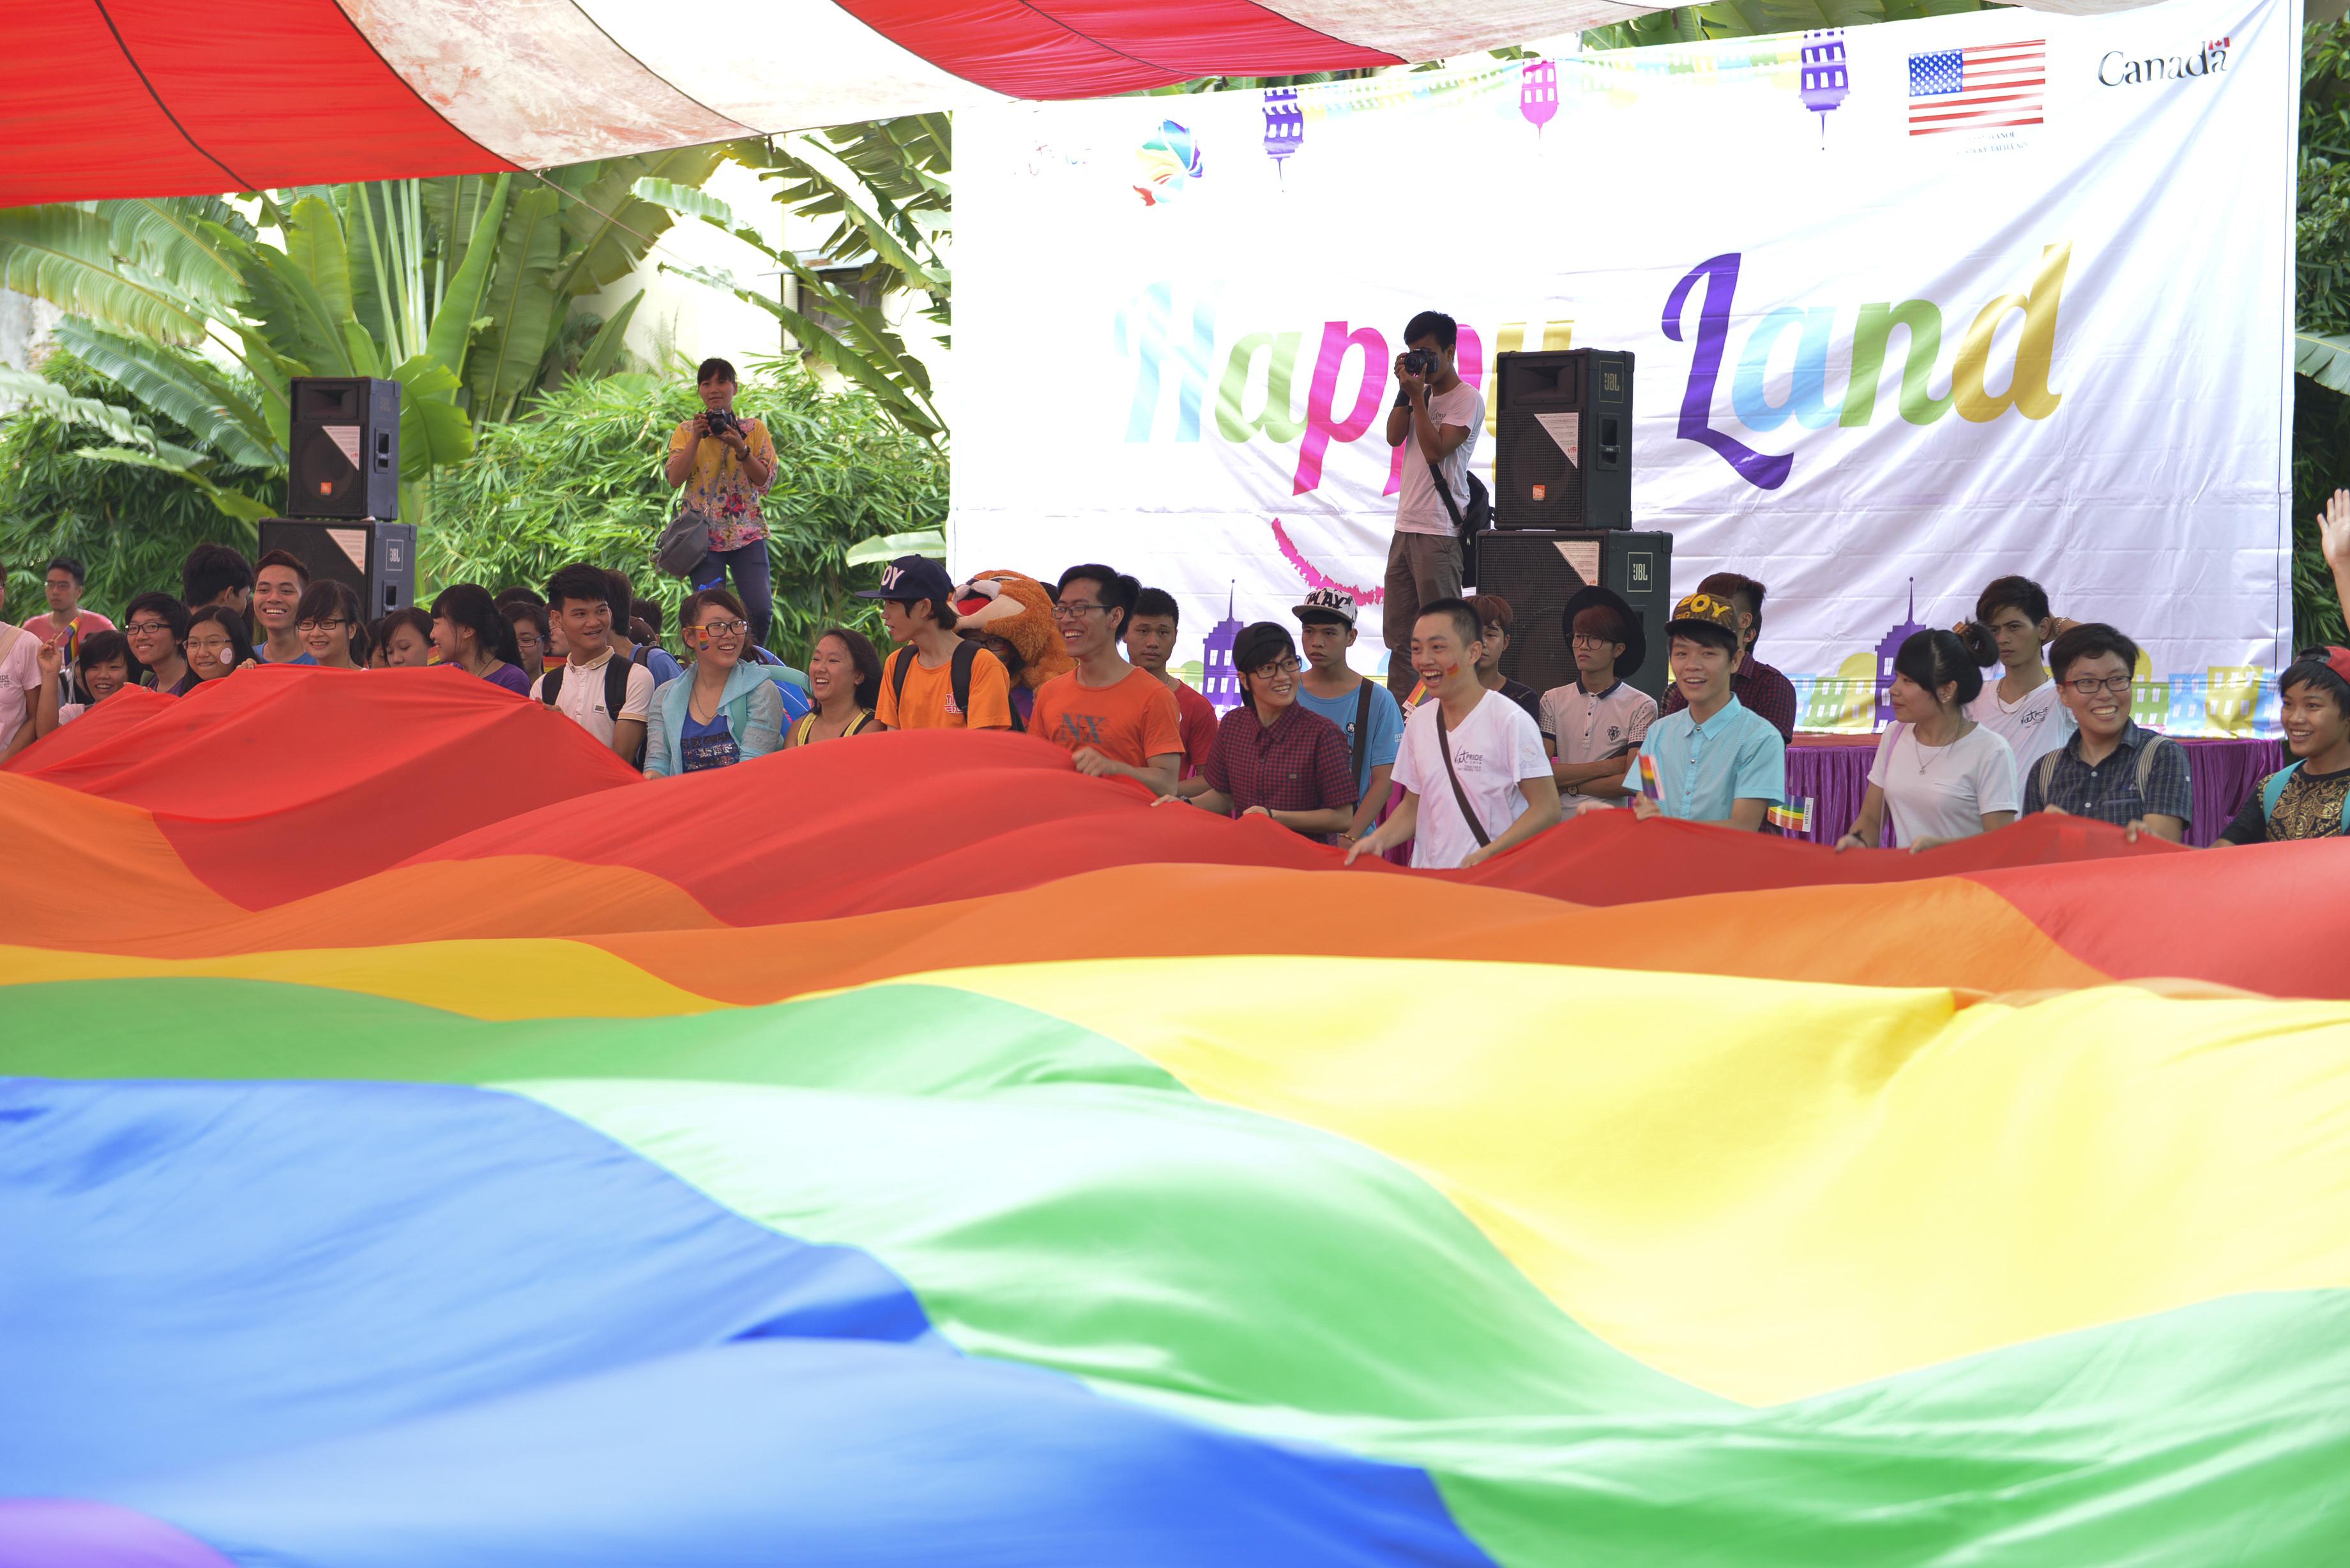 File:2014 Viet Pride Campaign (14638593749).jpg - Wikimedia Commons